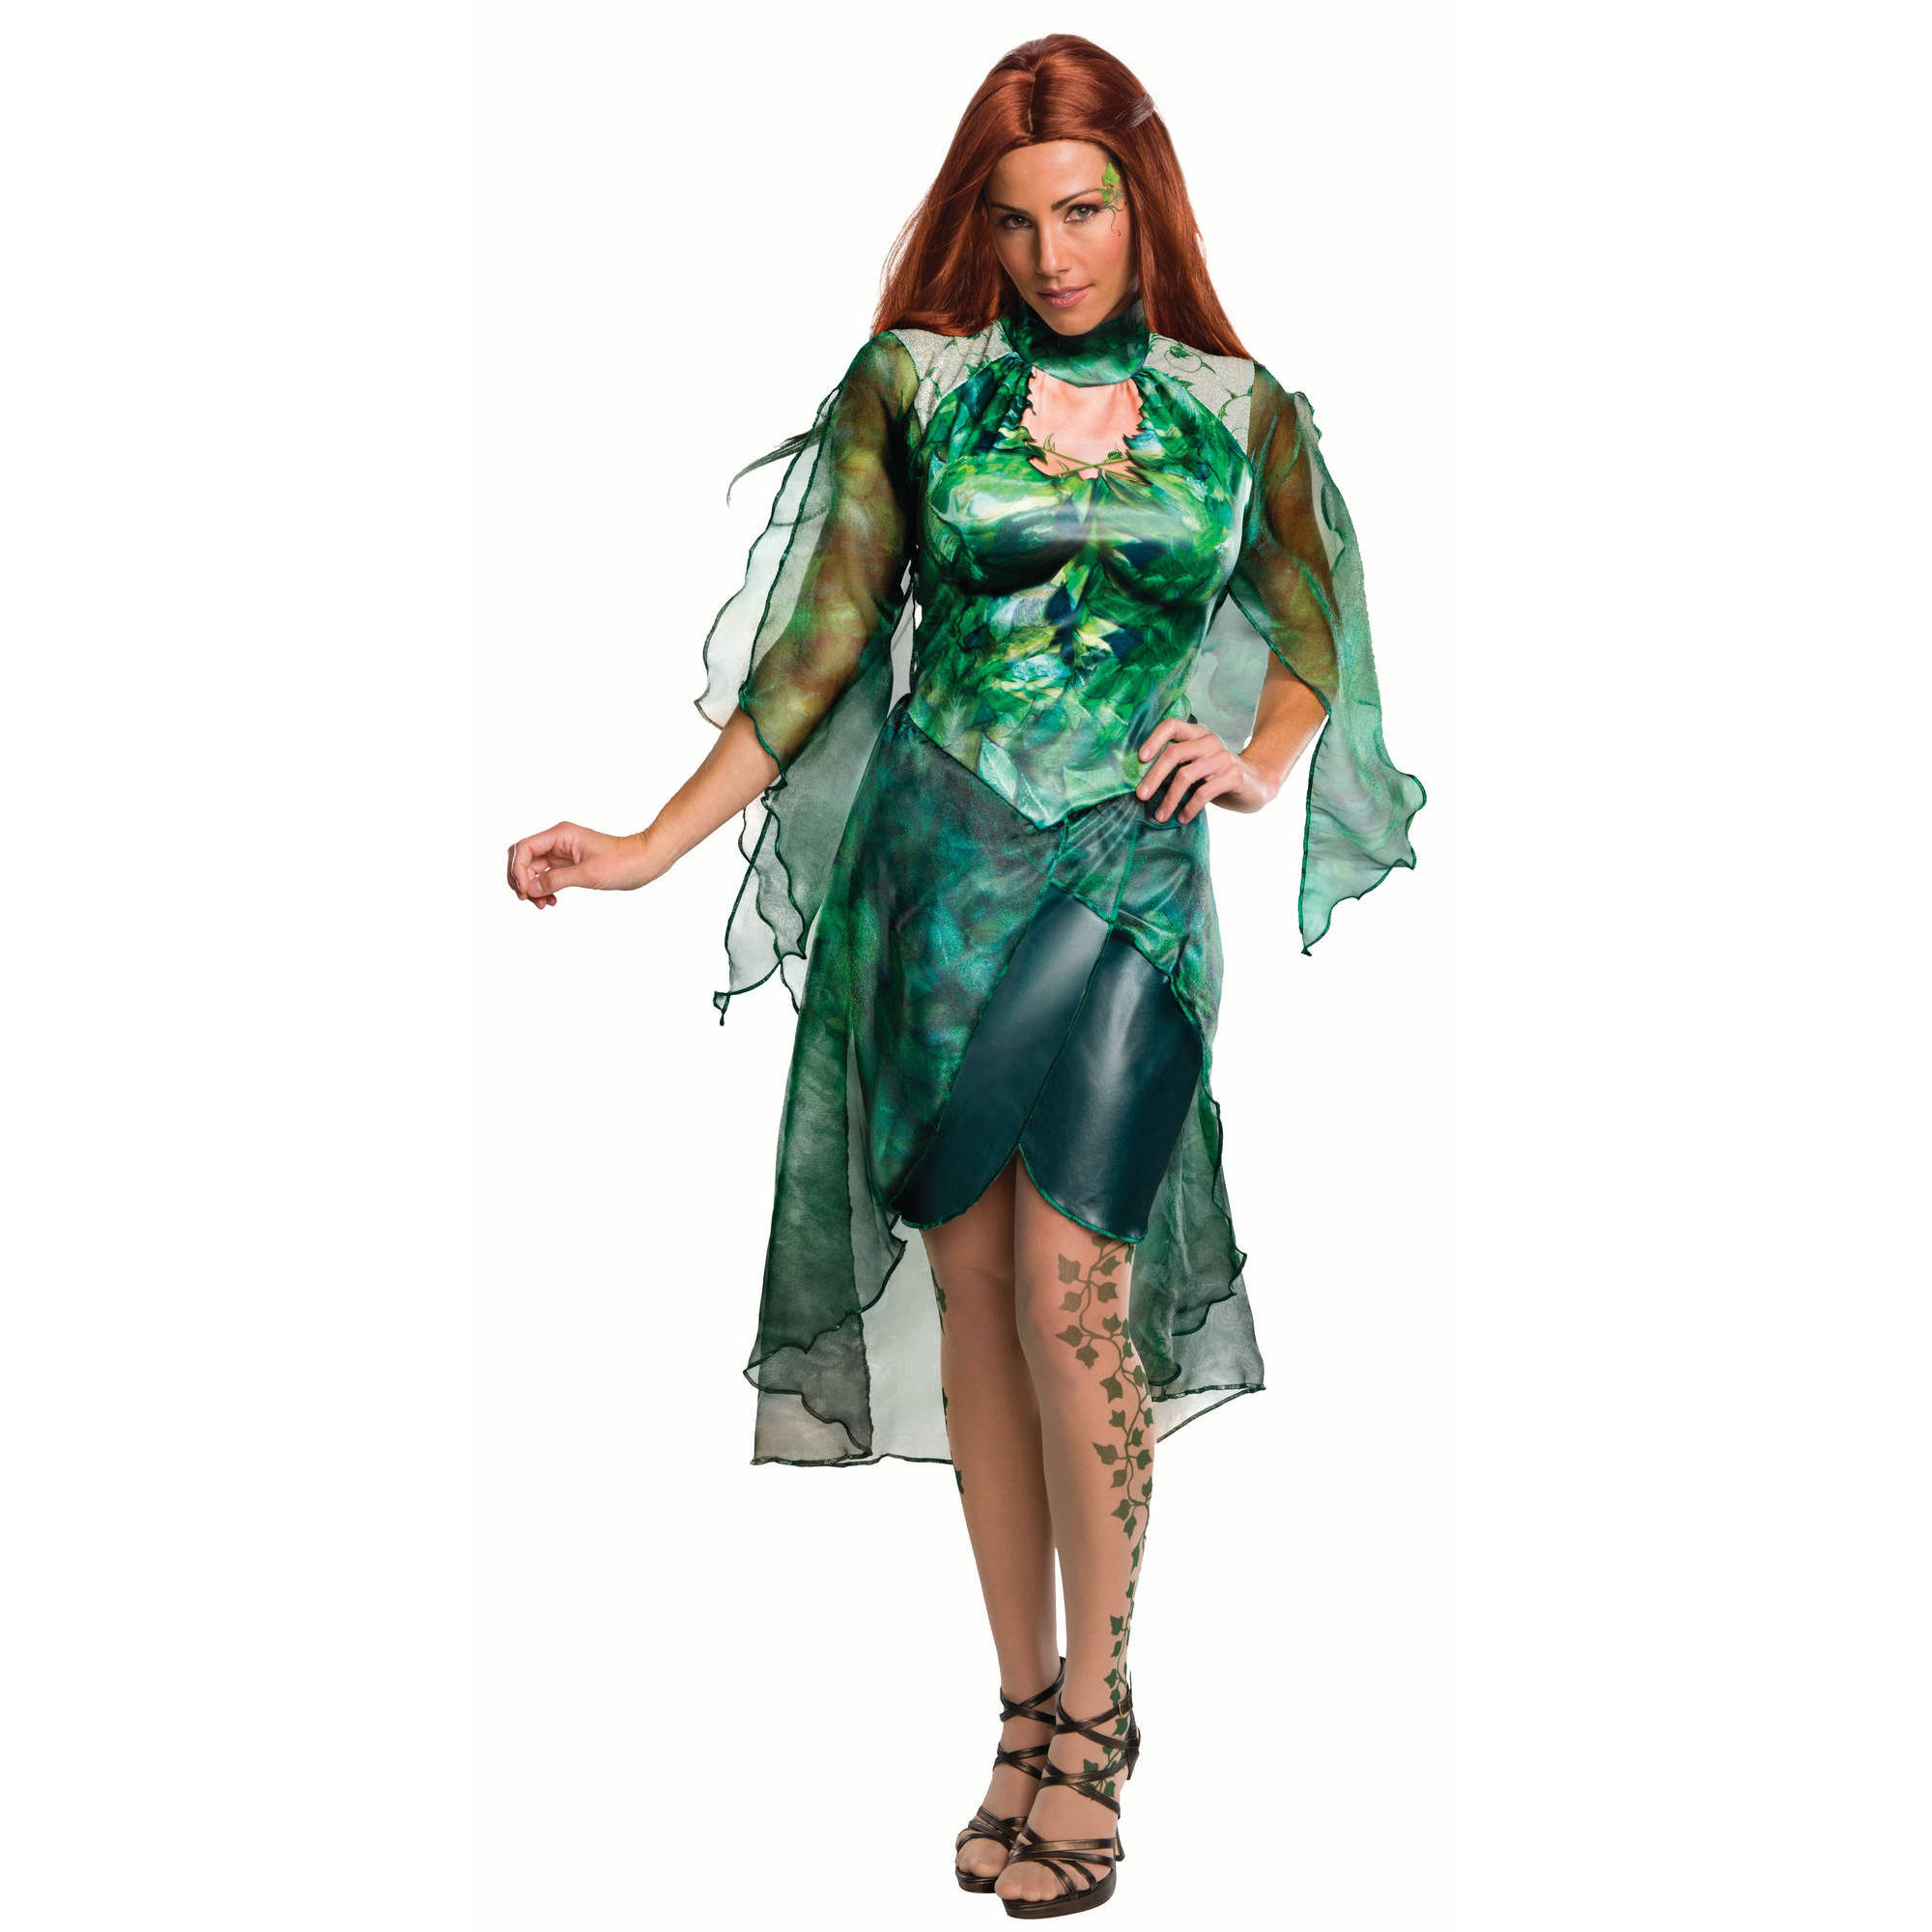 73cb890e2c3 Poison Ivy Adult Dress Halloween Costume   eBay